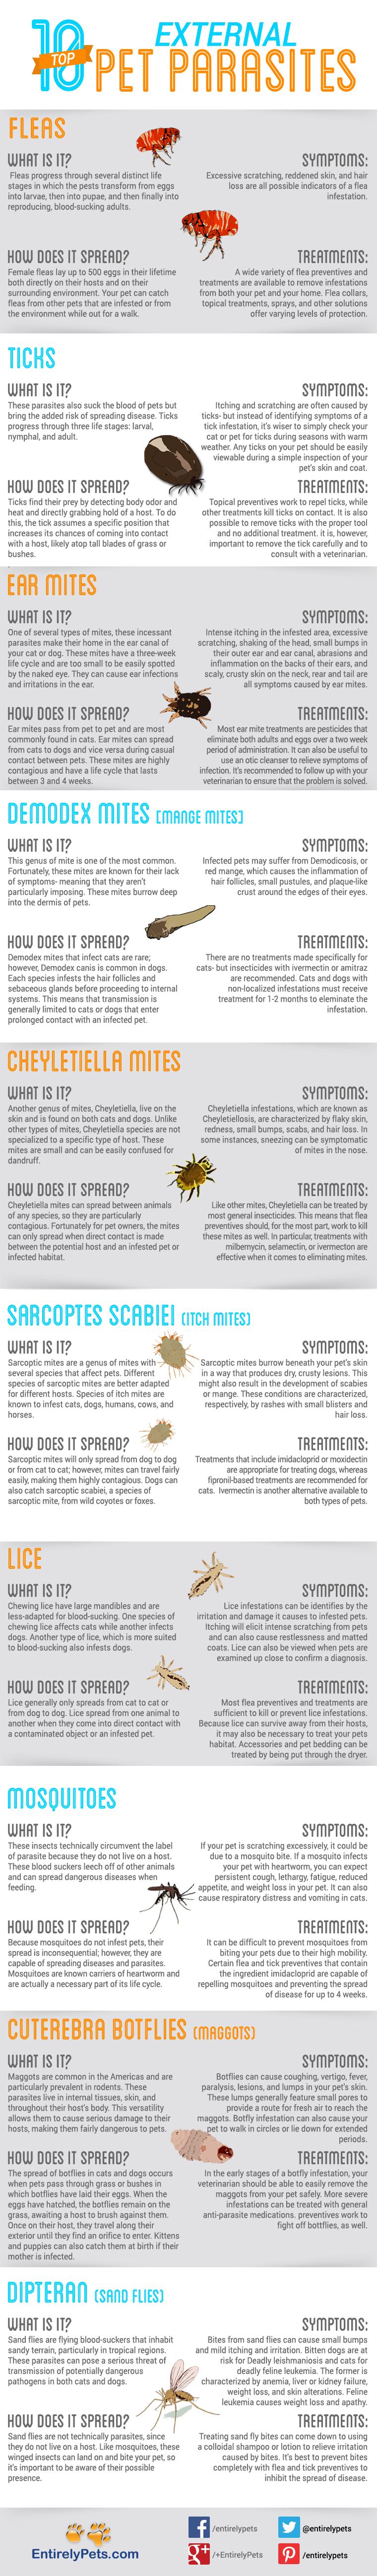 Deadly Parasite List Infographic